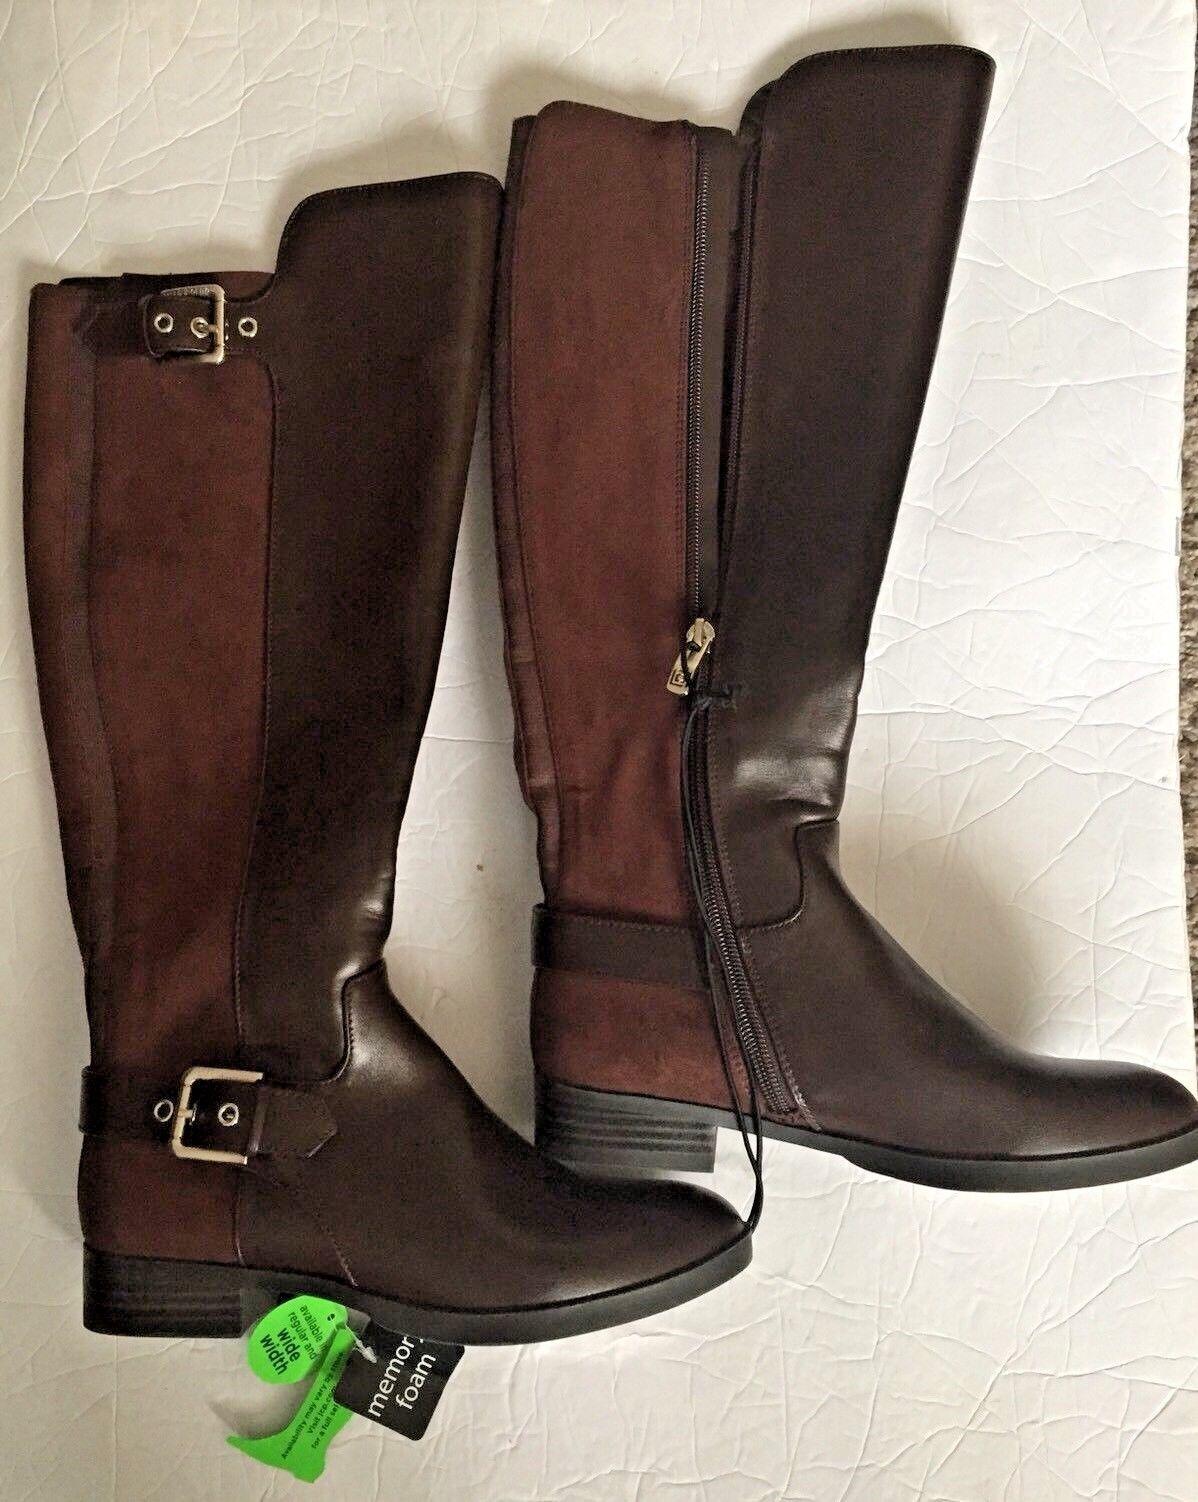 Womens Liz Claiborne Dallas Riding Style Fashion Boots. Brown. Size 5 M